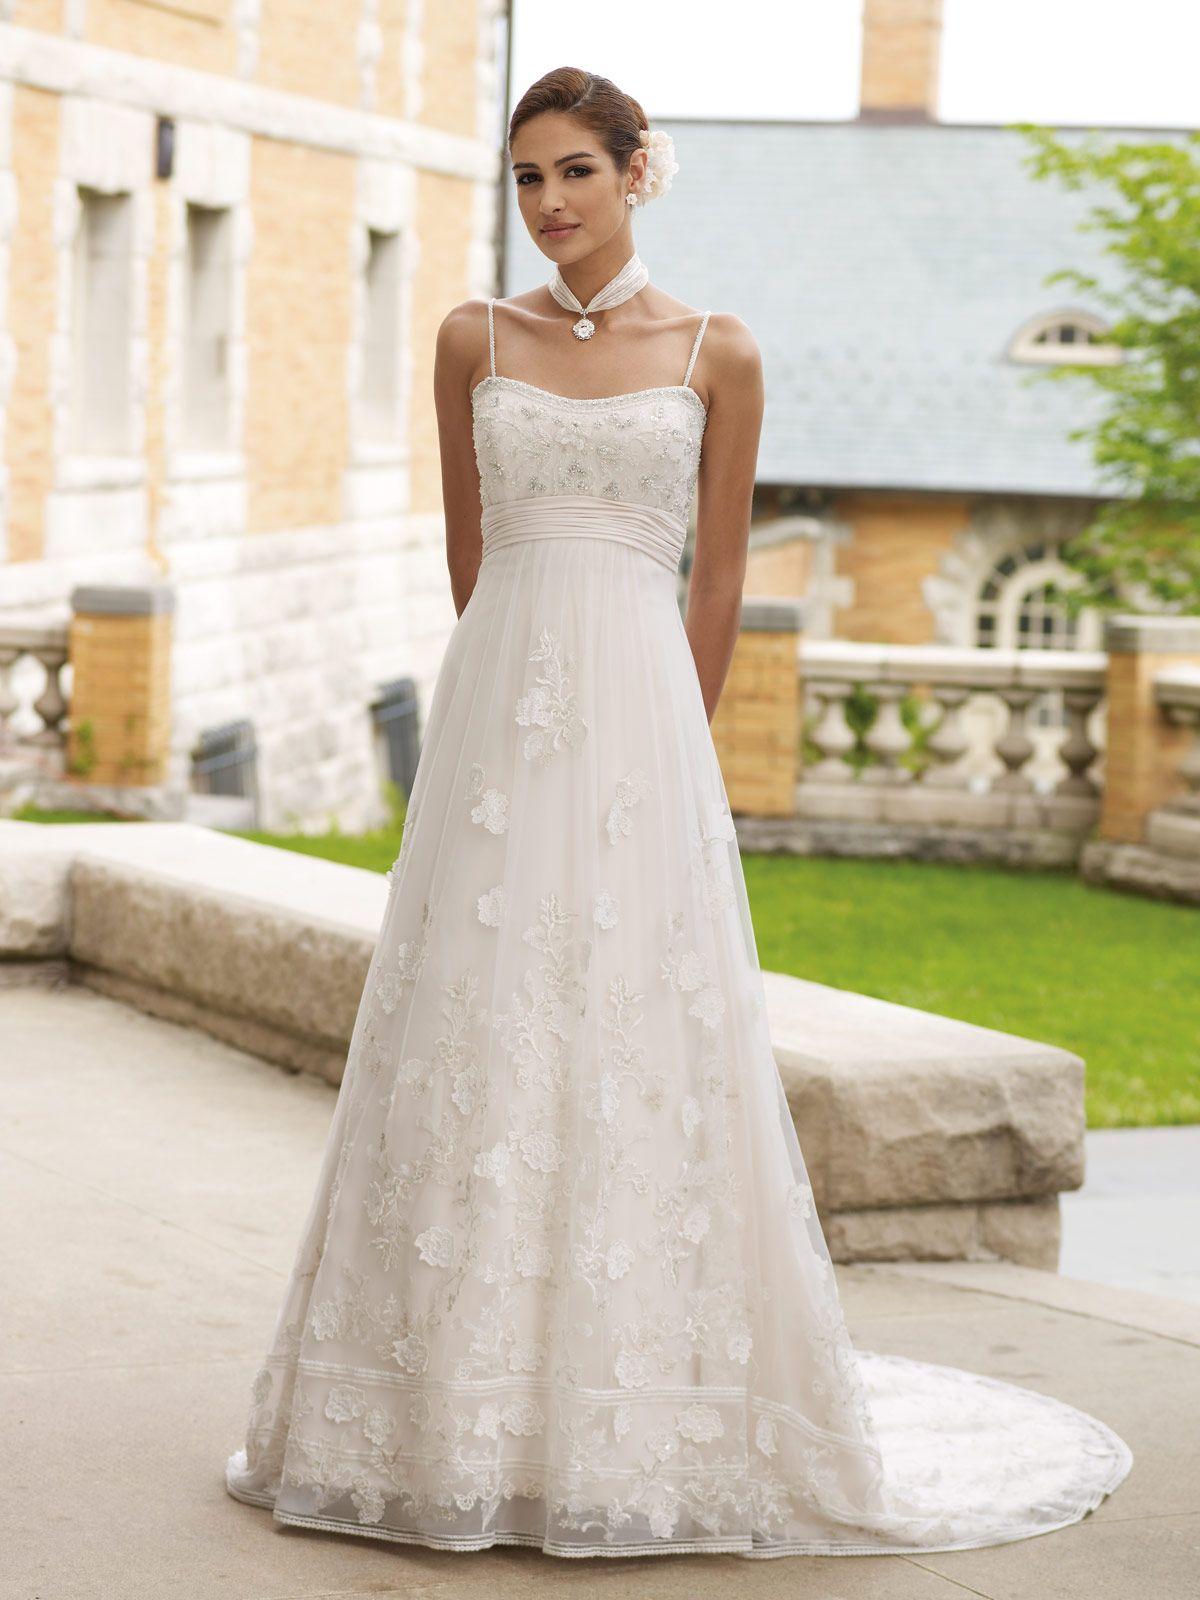 Maternity wedding dress with sleeves  Mon Cheri  Keegan  Wedding Dresses  Pinterest  David tutera